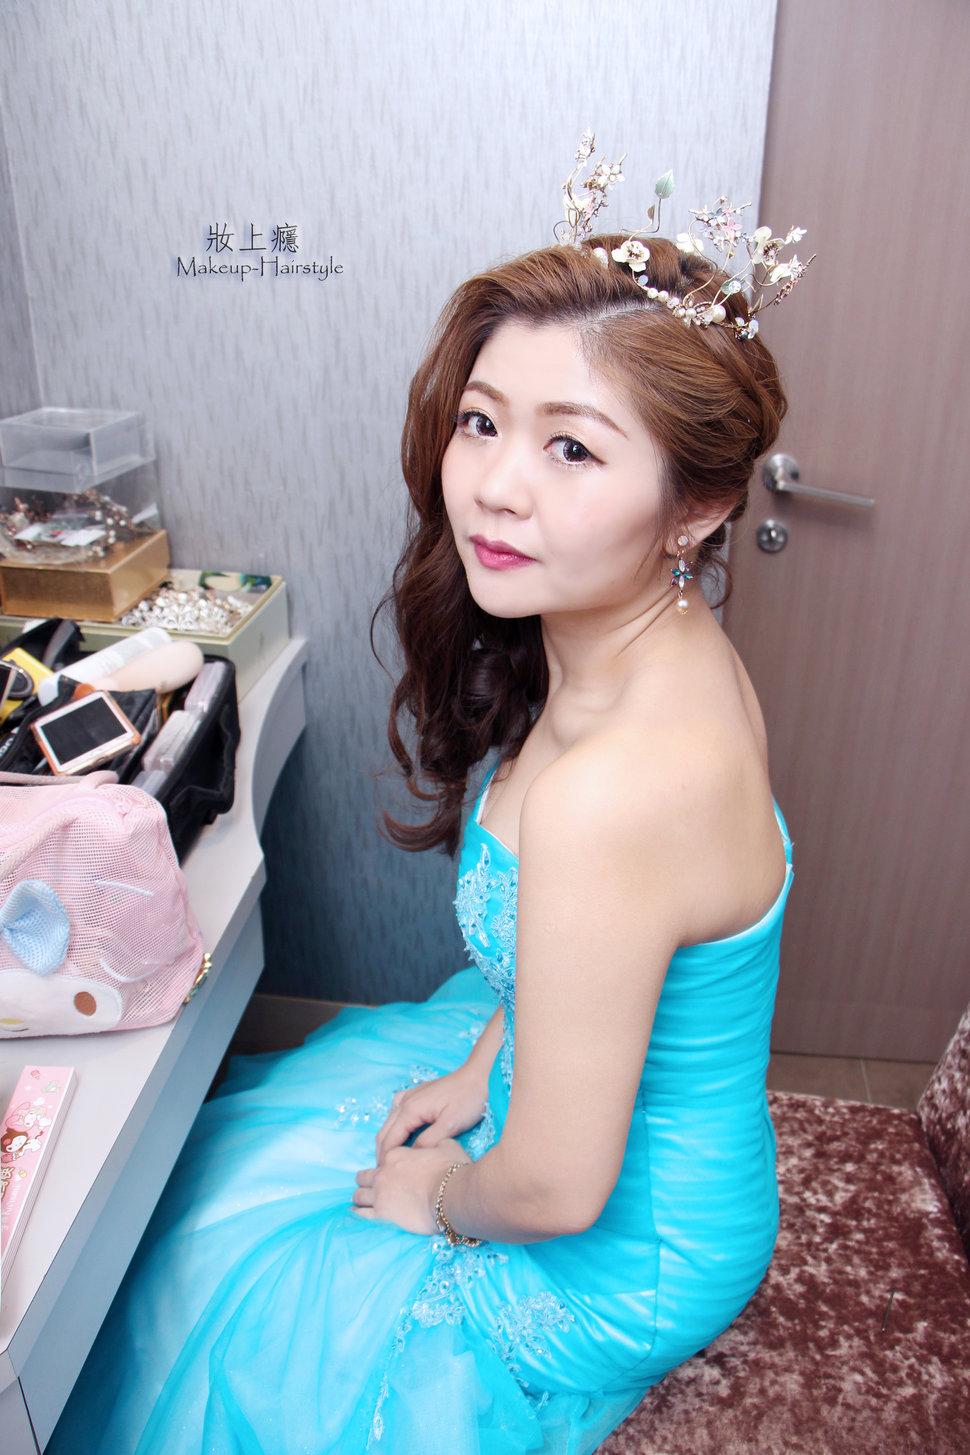 12 - Makeup-hairstyle 妝上癮 - 結婚吧一站式婚禮服務平台